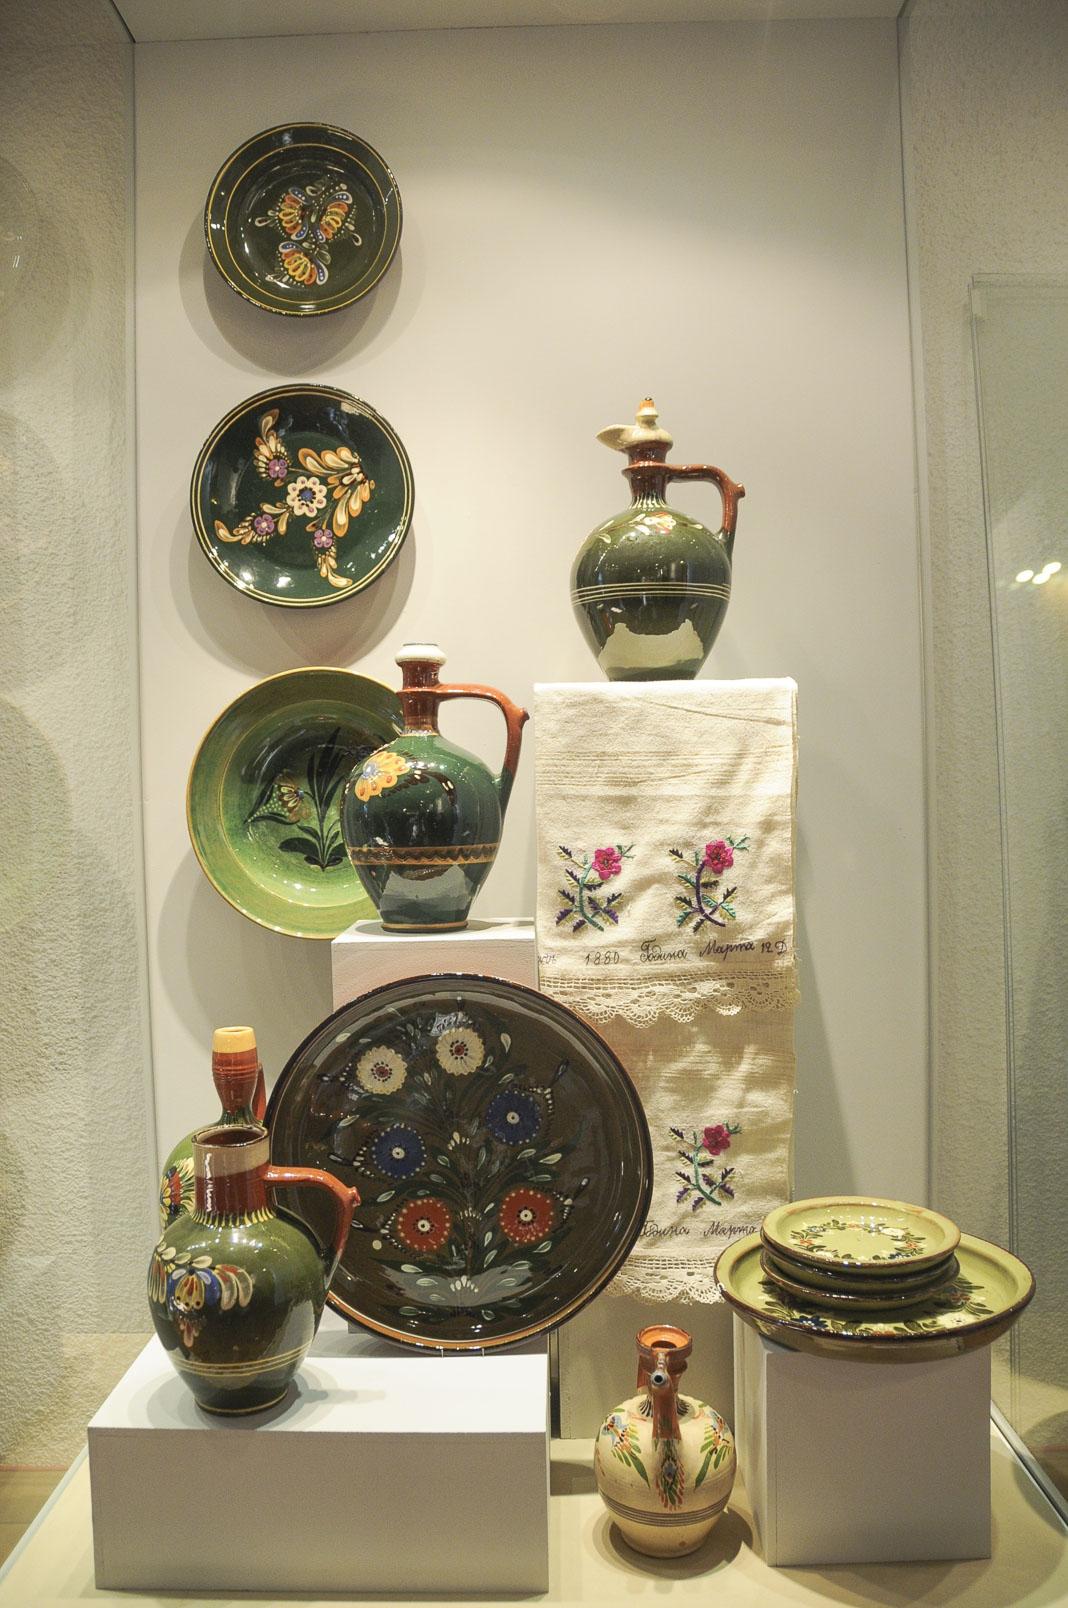 troyan-museum-cvetqta-na-zografa-19